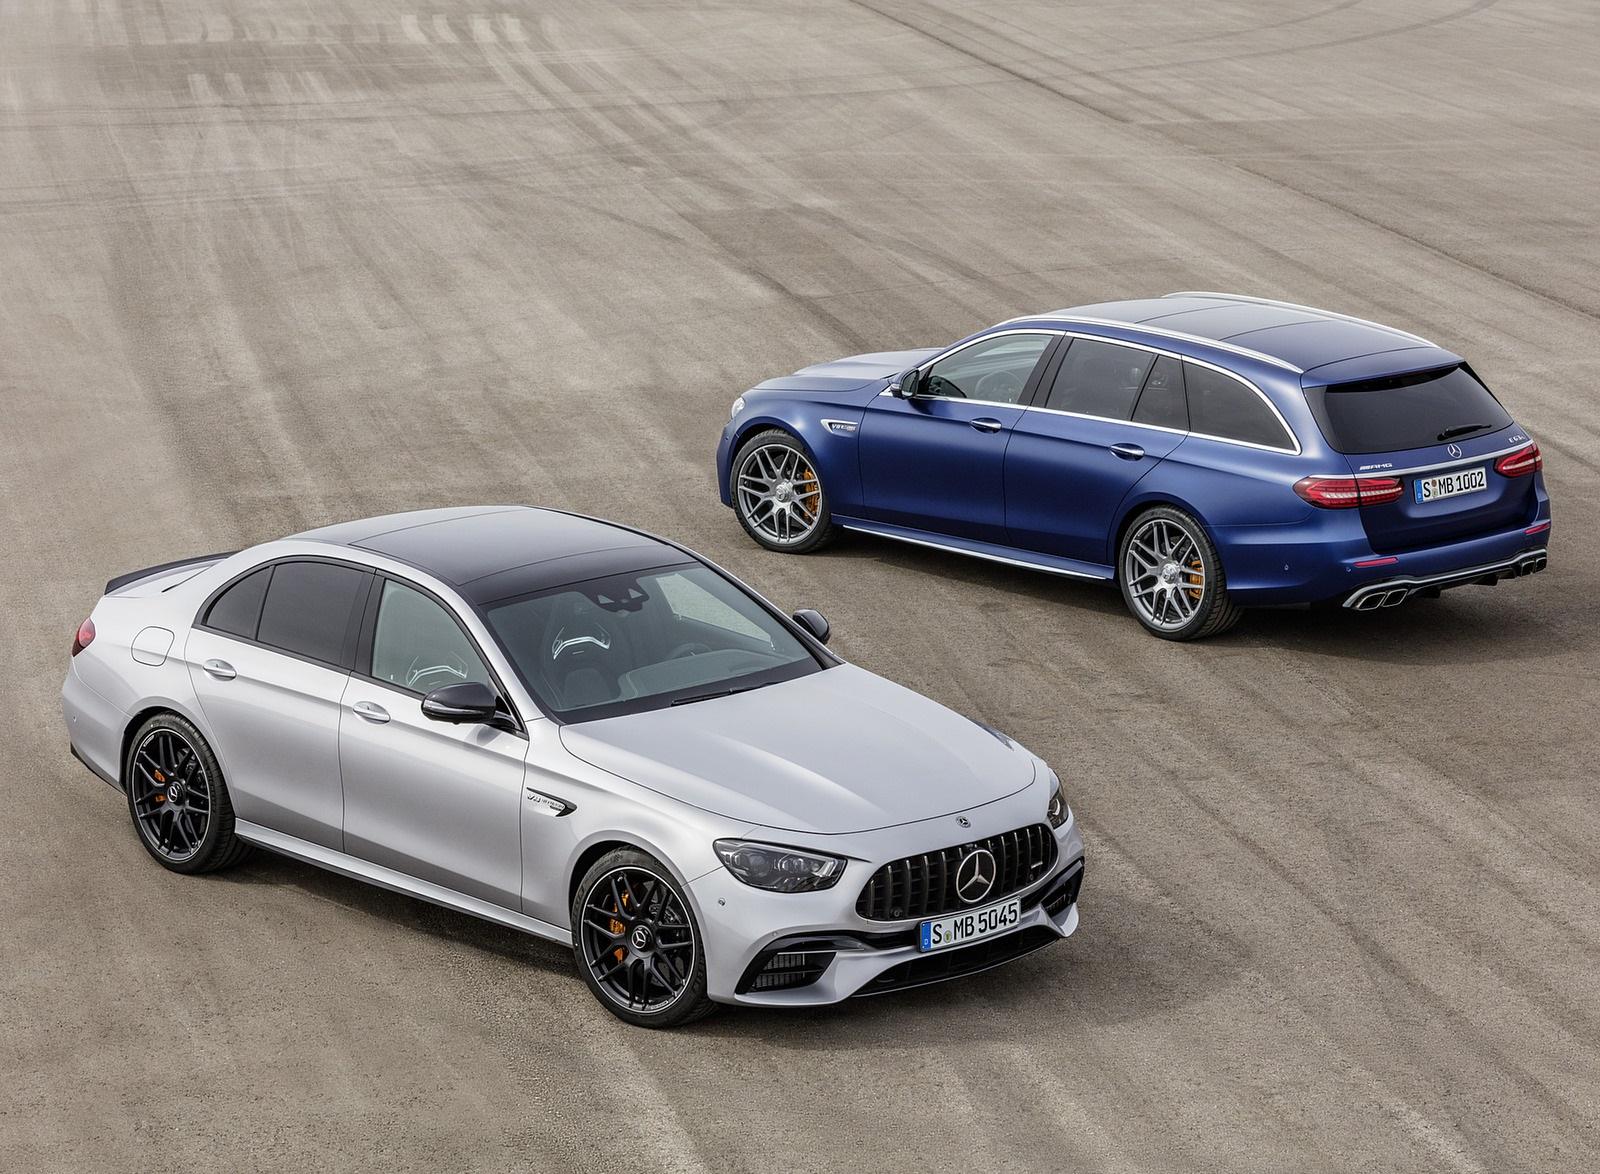 2021 Mercedes-AMG E 63 S Sedan and Estate Wallpapers (10)